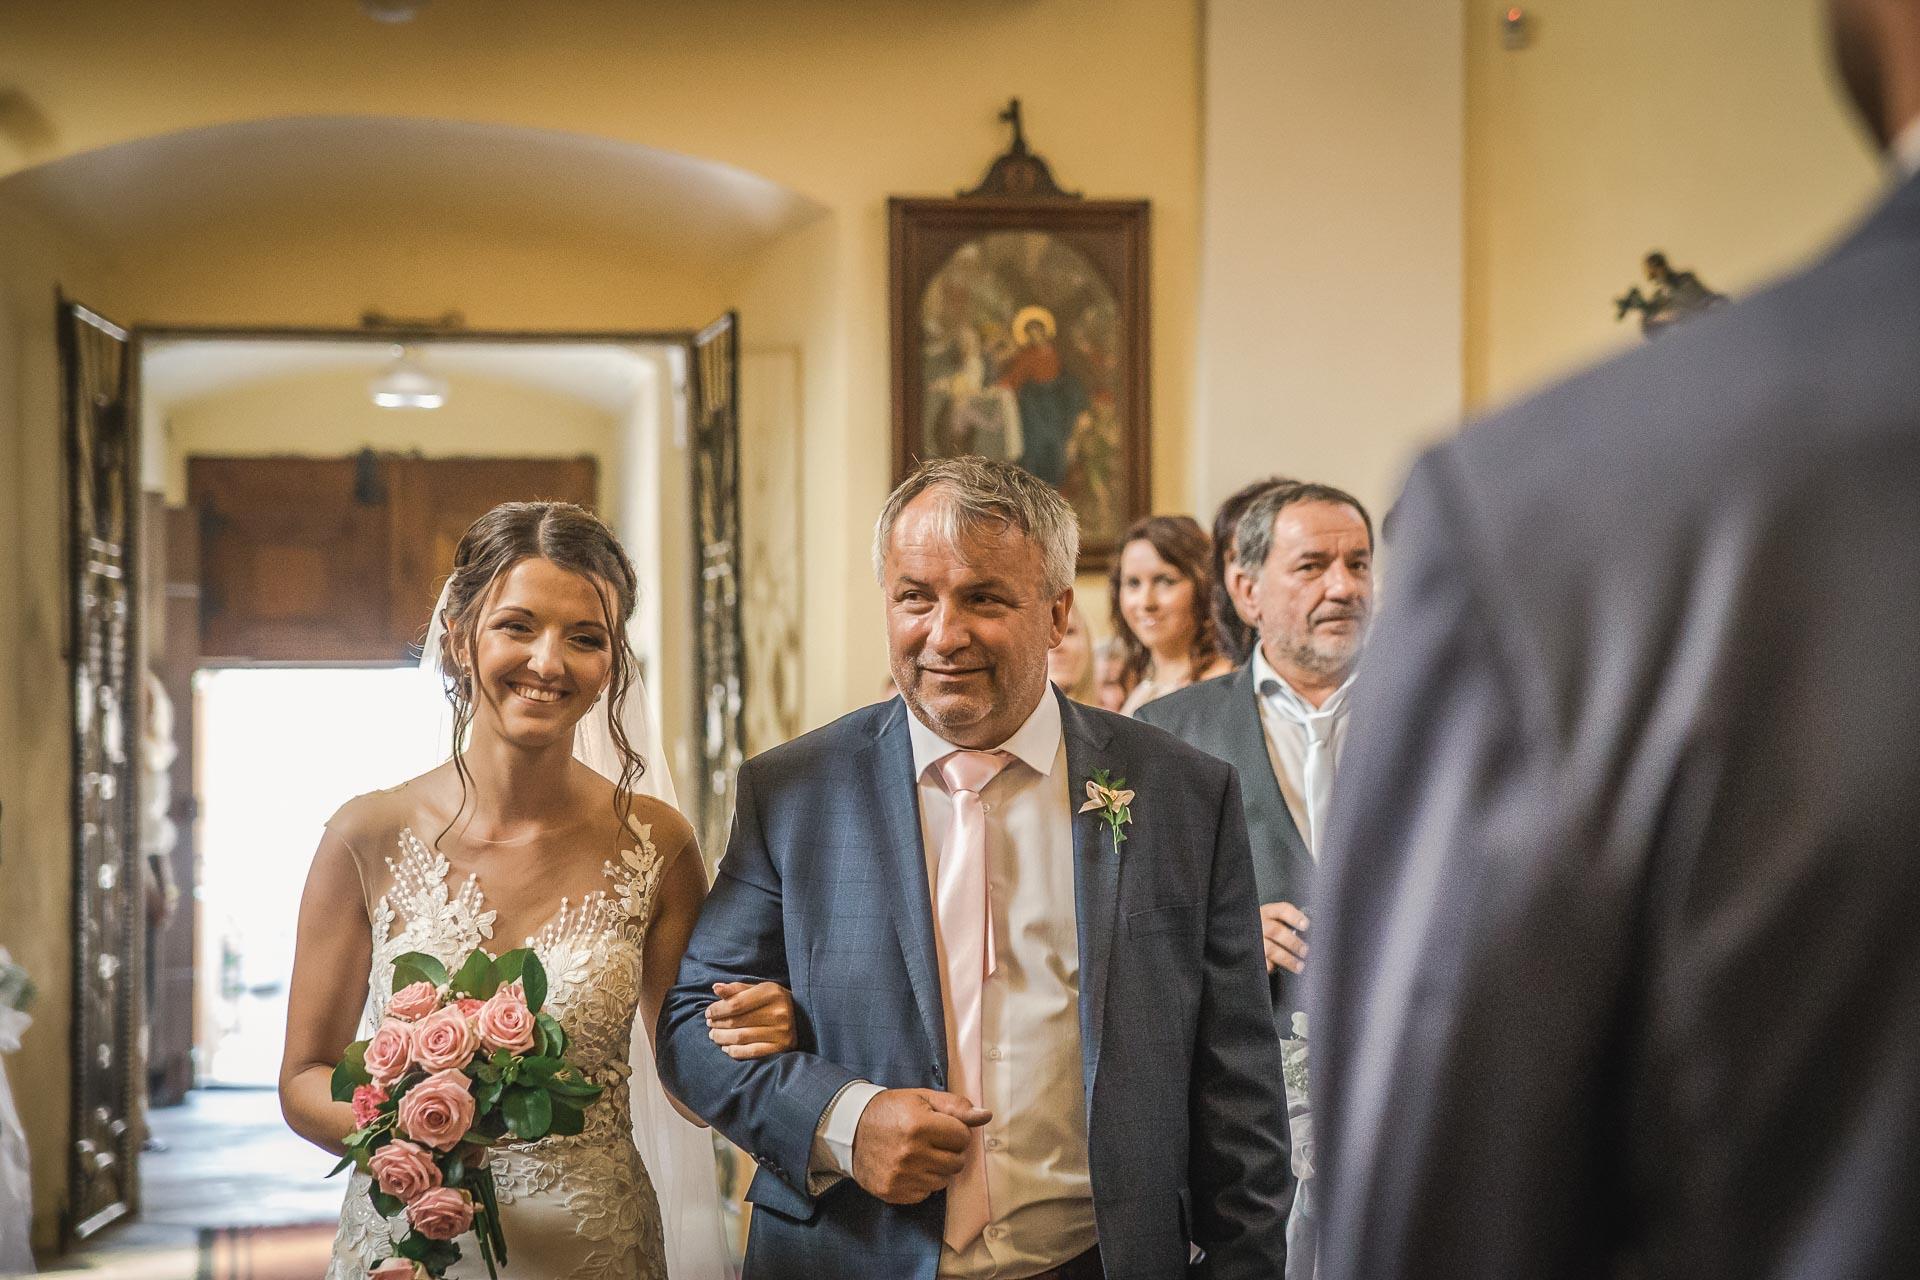 svatební-fotograf-wedding-svatebni-video-orlík-vltava-kostel-statek-stodola-boho-svatba-Beautyfoto-195